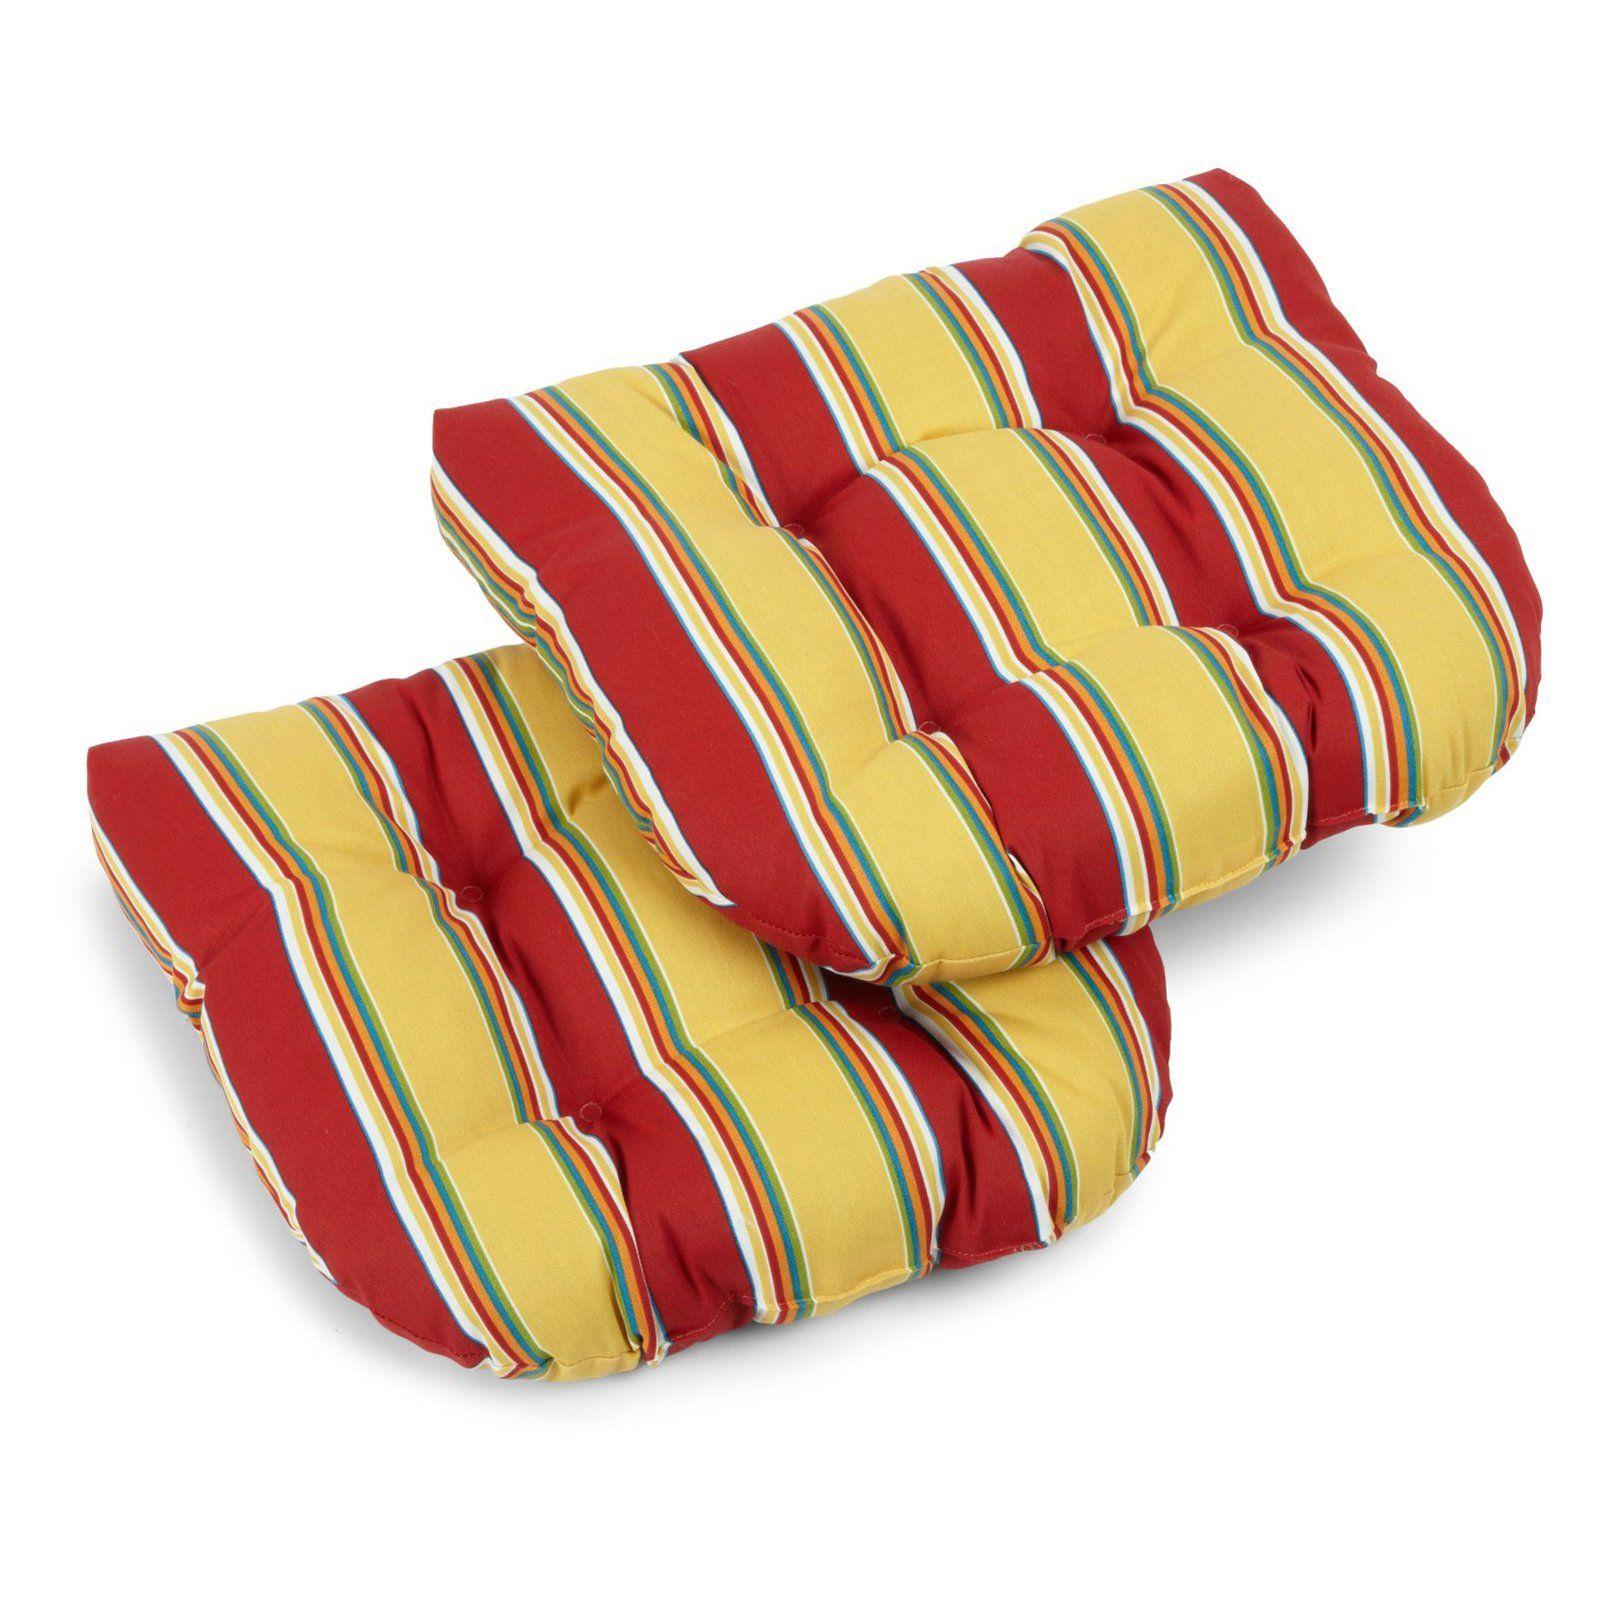 Blazing Needles Outdoor All Weather Uv Resistant Standard U Shaped Patio Chair Cushion Set Of 2 52 99 Hayneedle